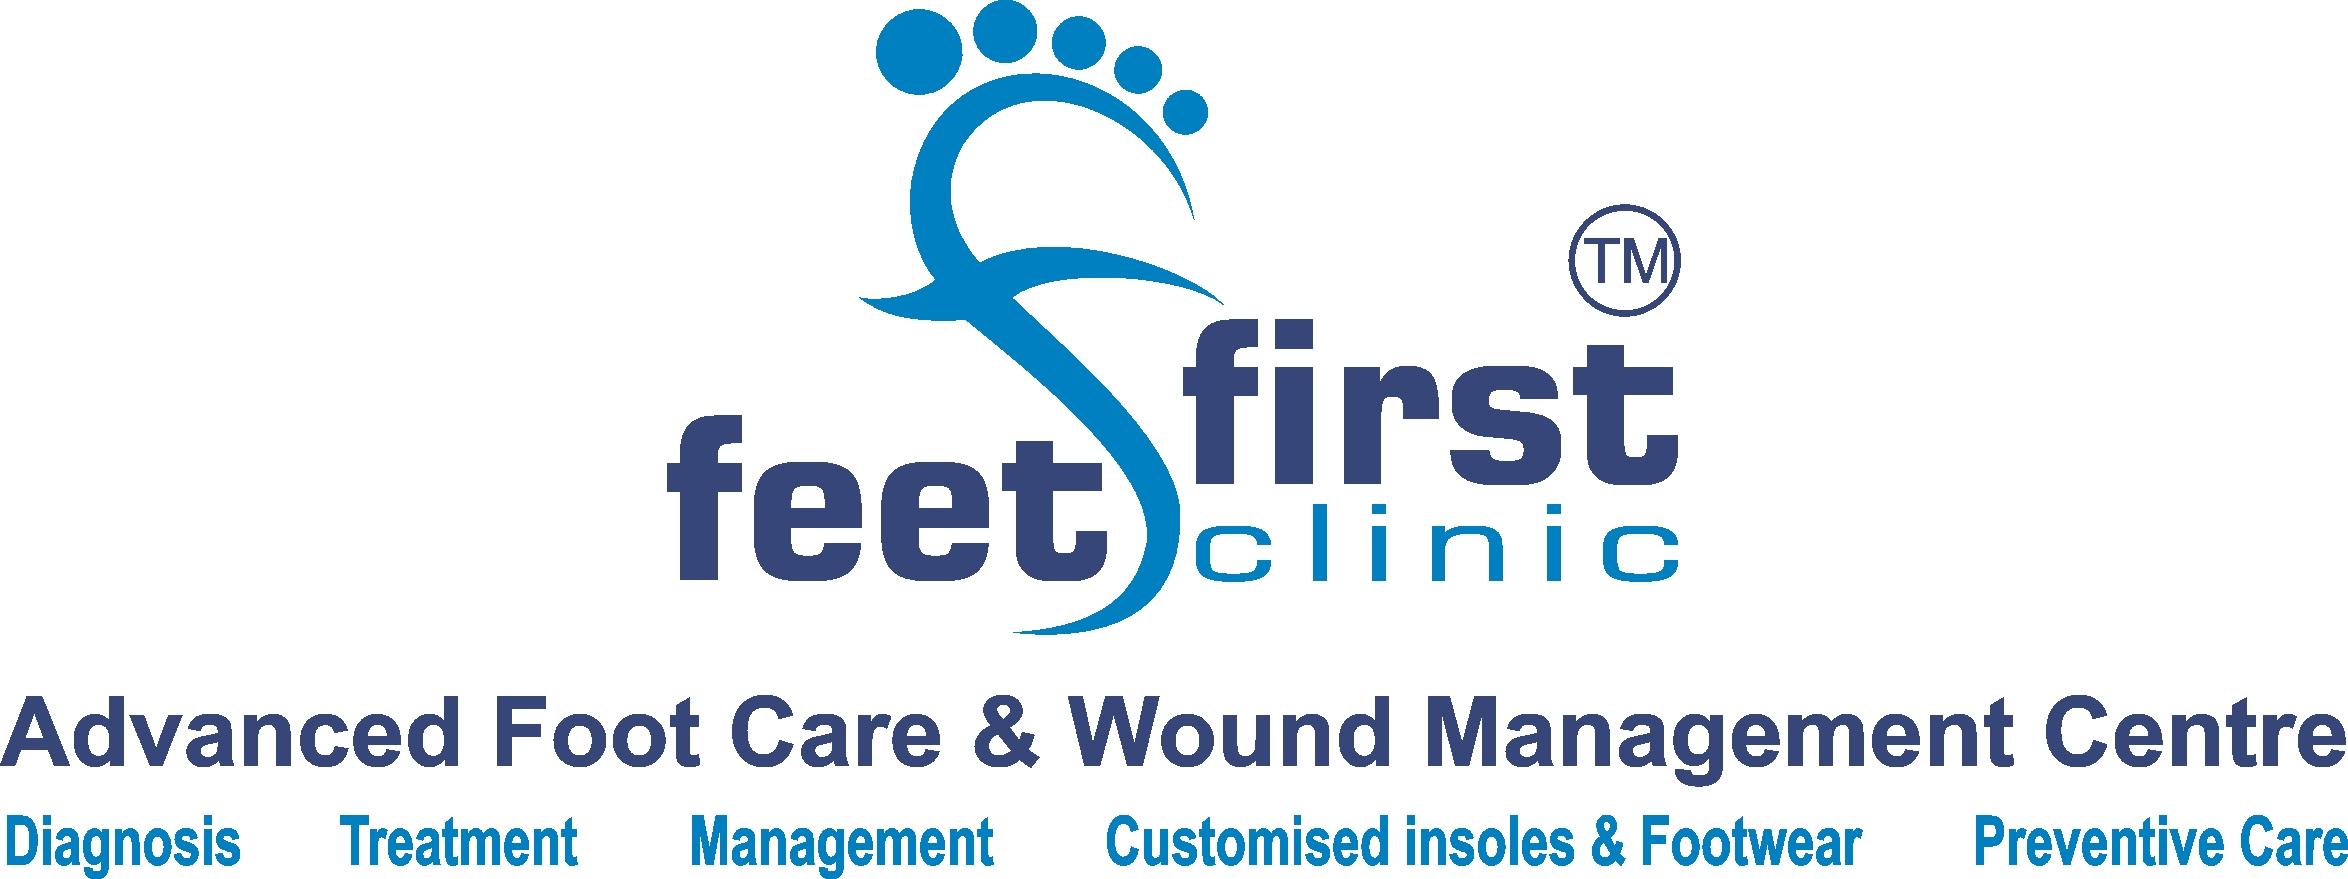 Feet First Clinic - Dr. Vaidya's Speciality Centre, Matunga (W)